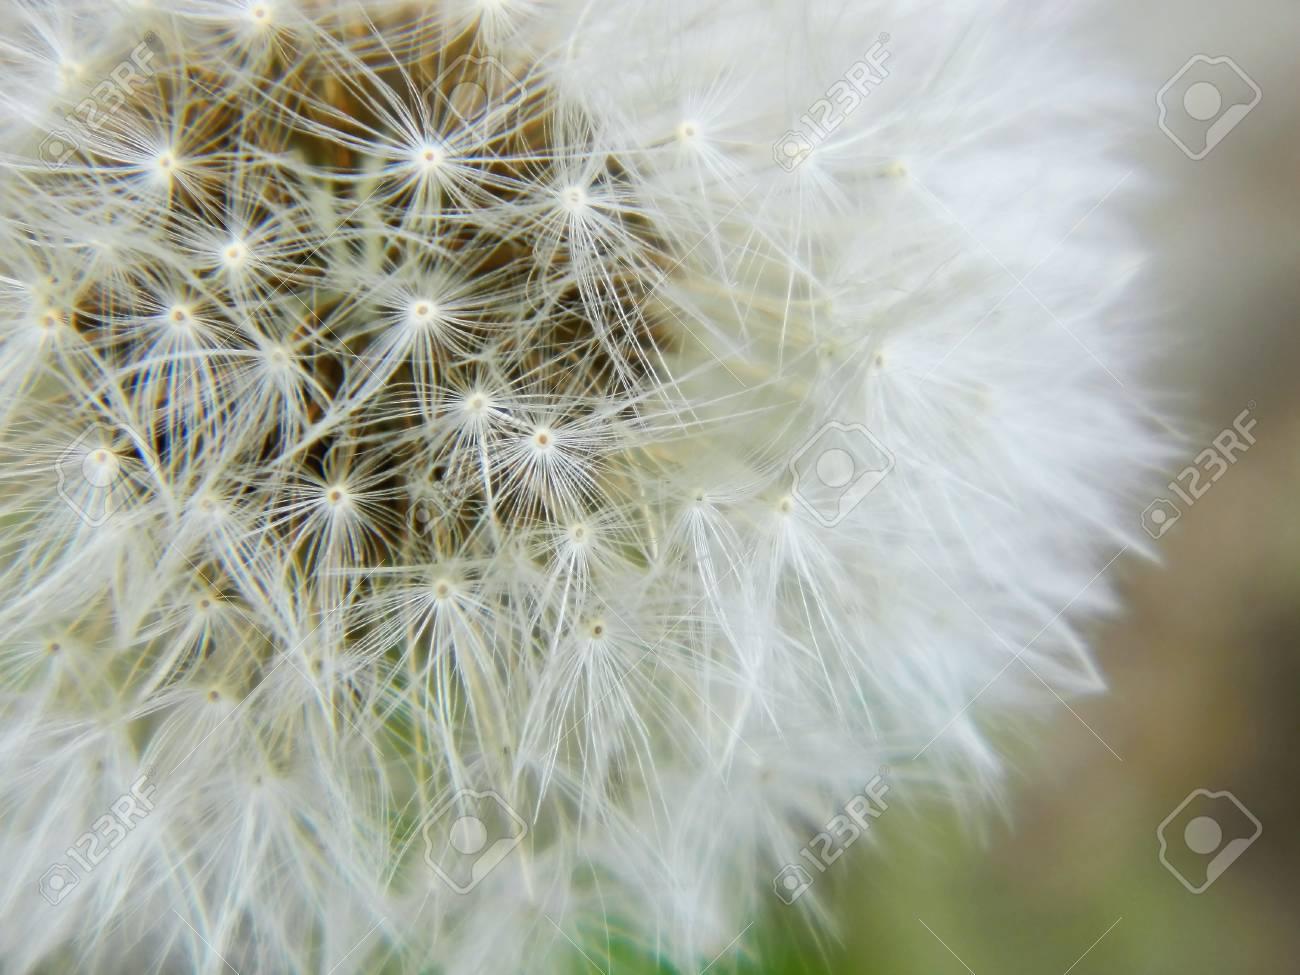 Dandelion seed outdoors - 13991793